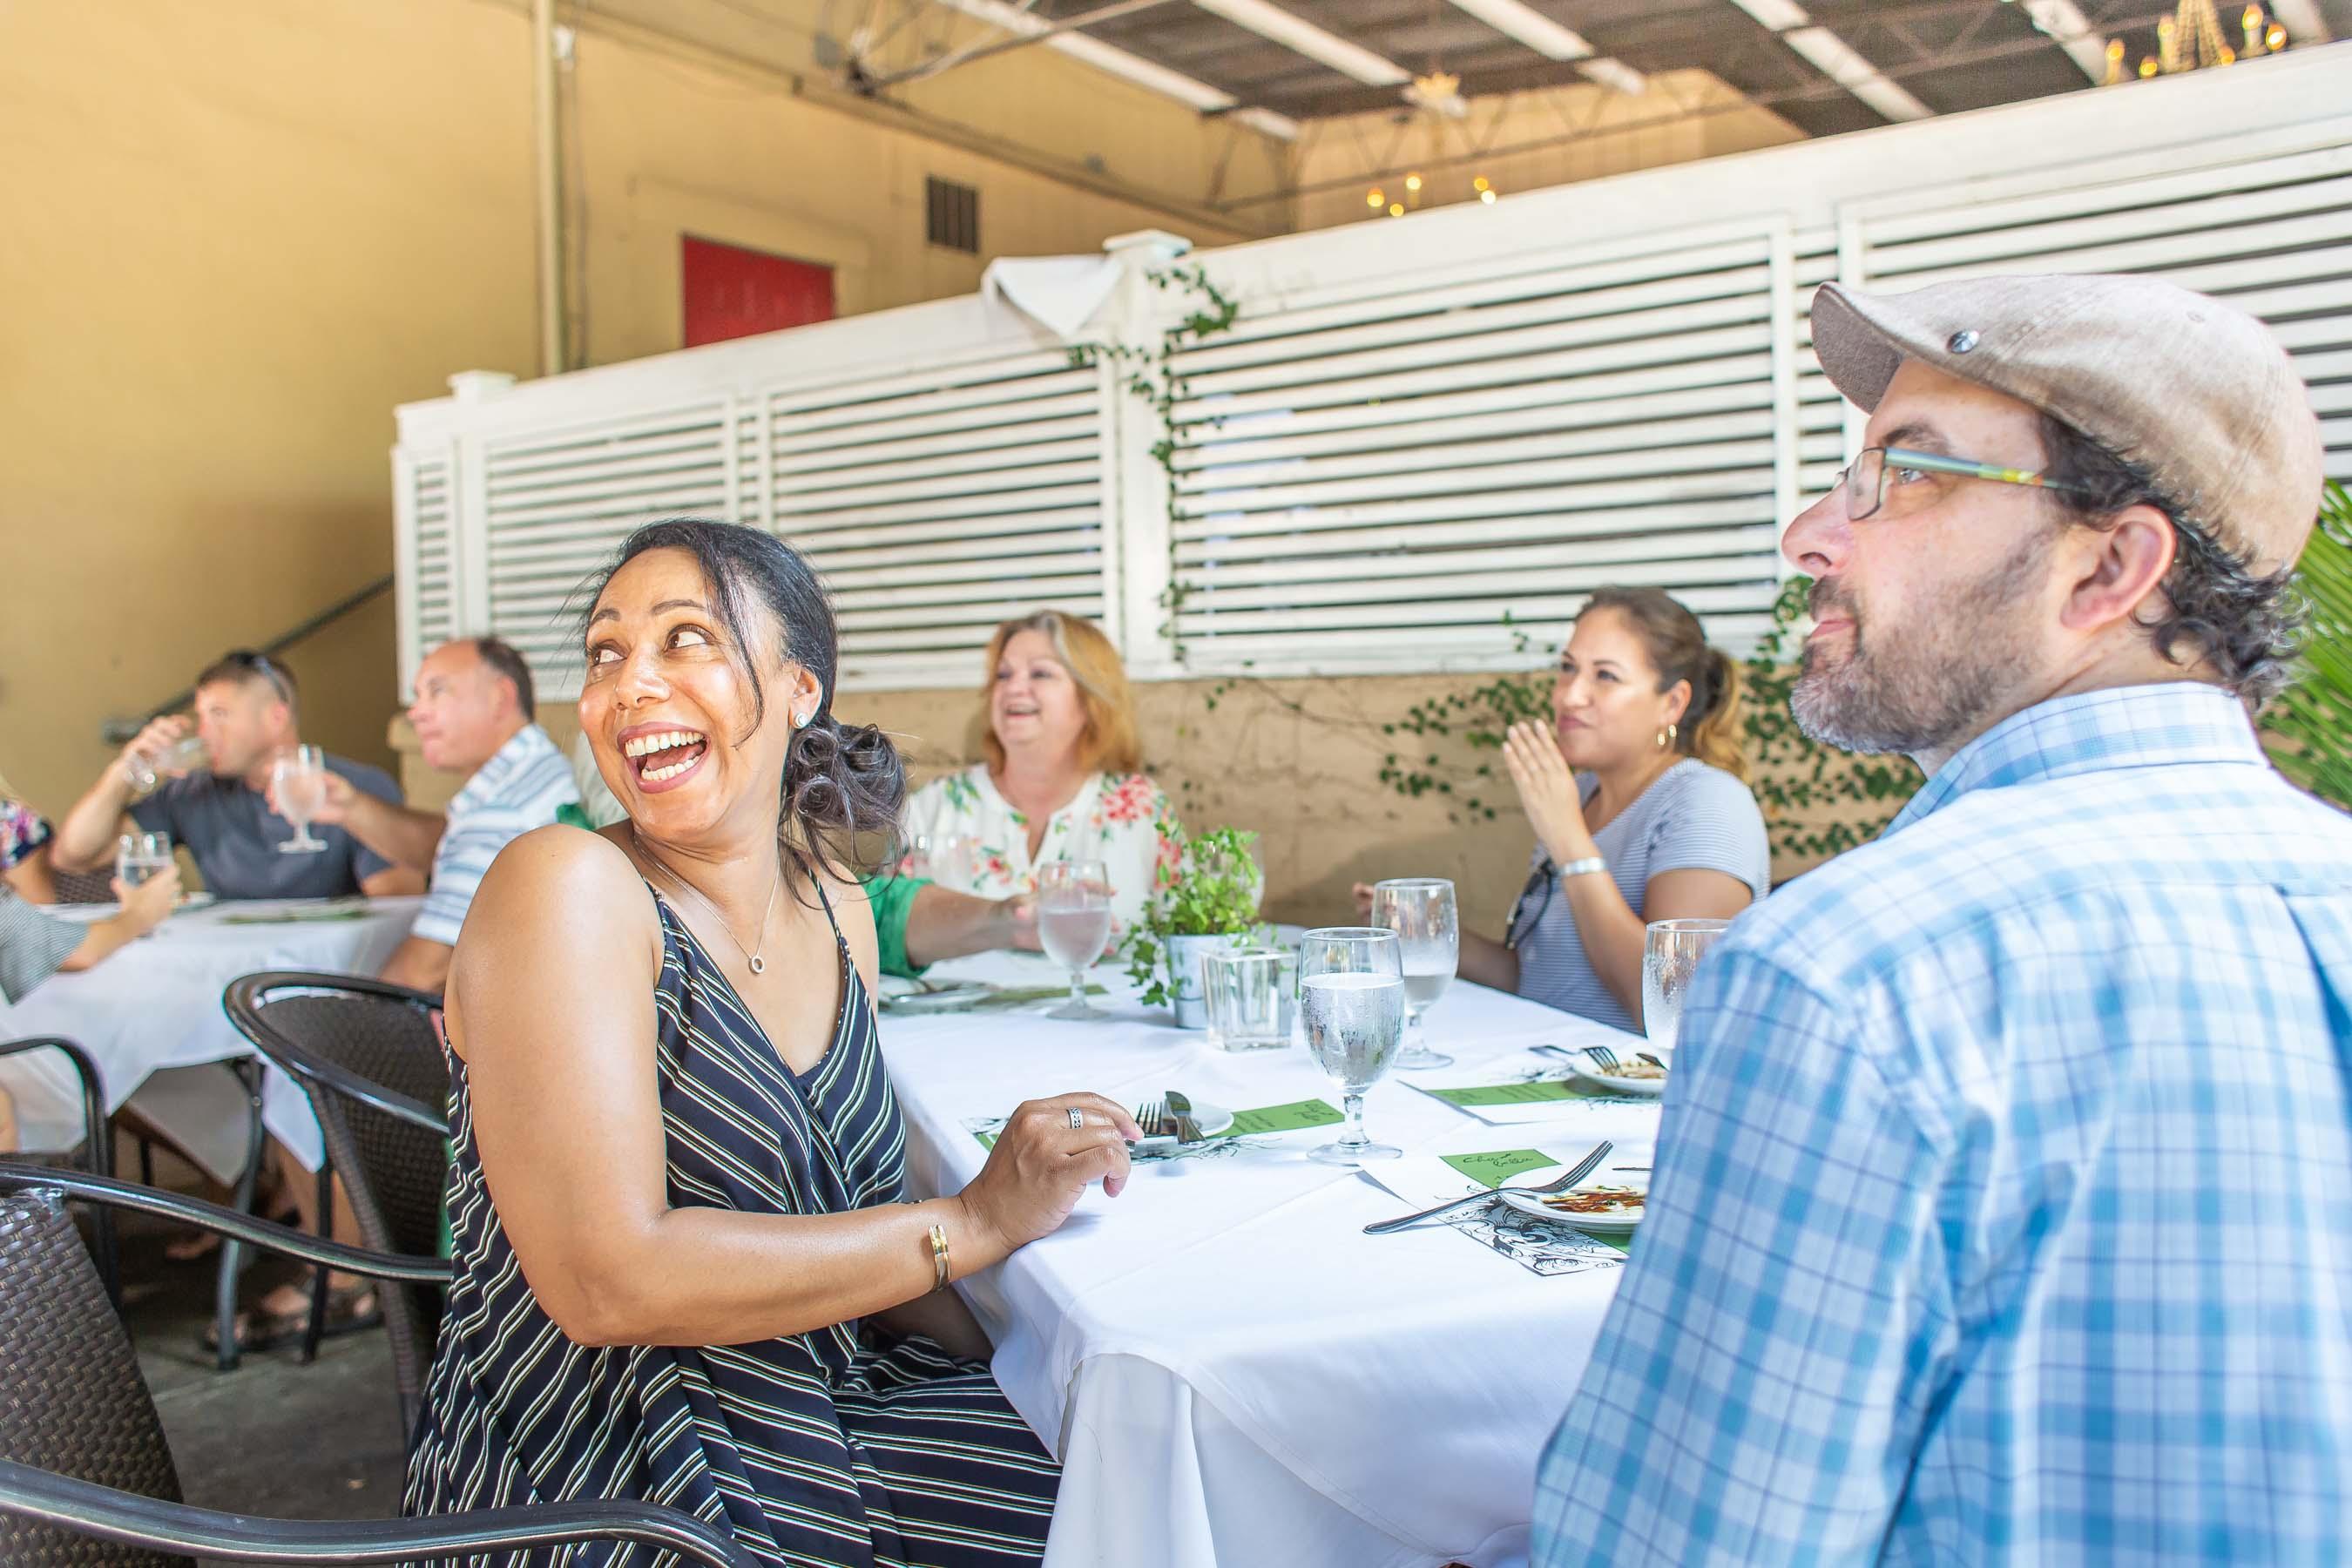 Savannah Taste Experience Launches In-Home Food Tour